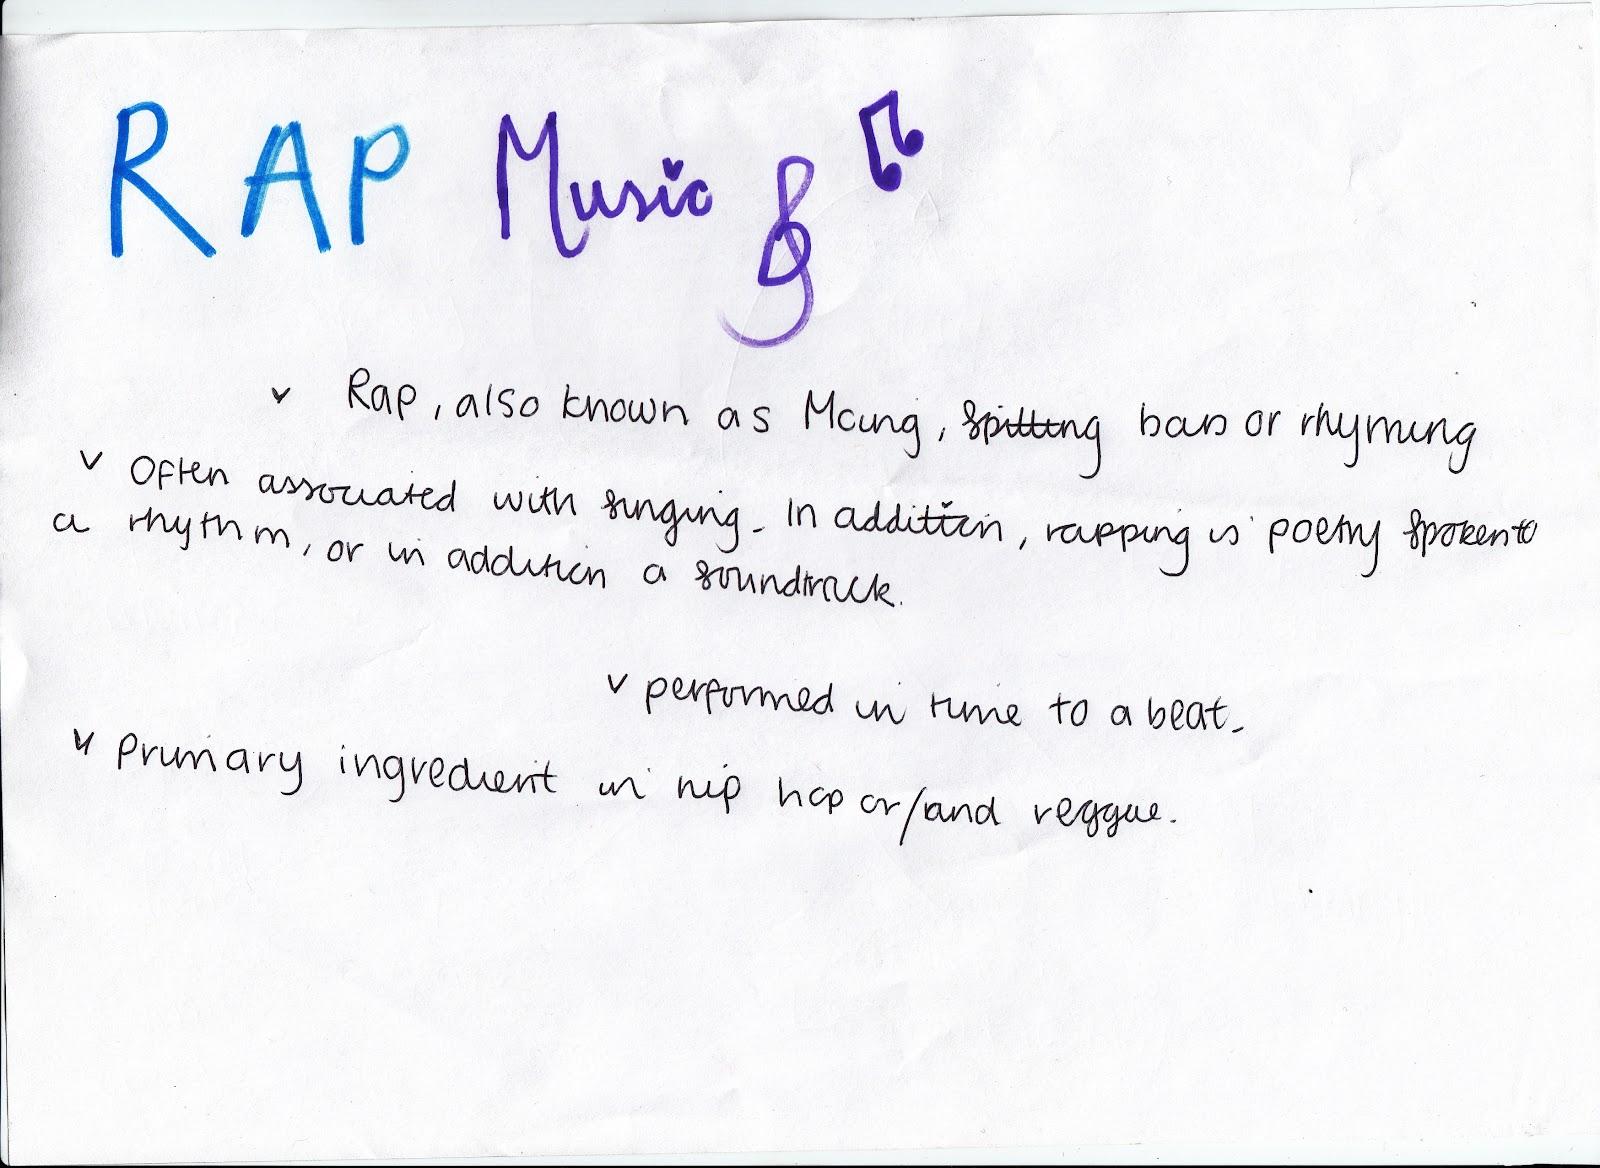 A study on rap music